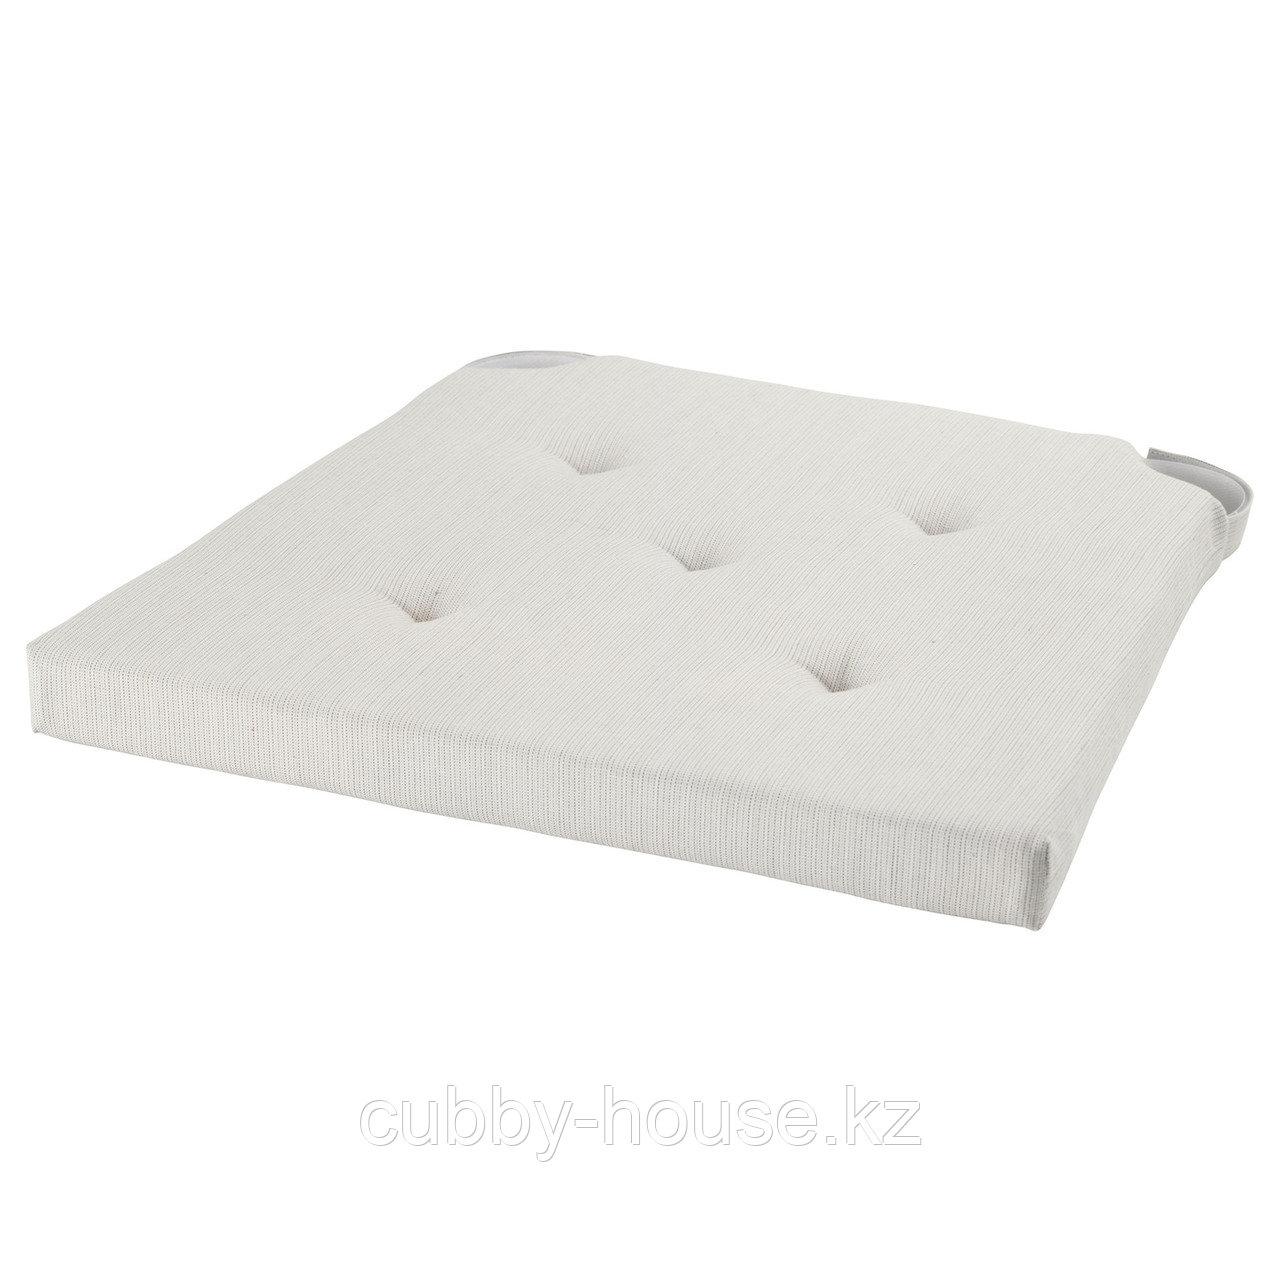 ЮСТИНА Подушка на стул, неокрашенный, 35/42x40x4.0 см